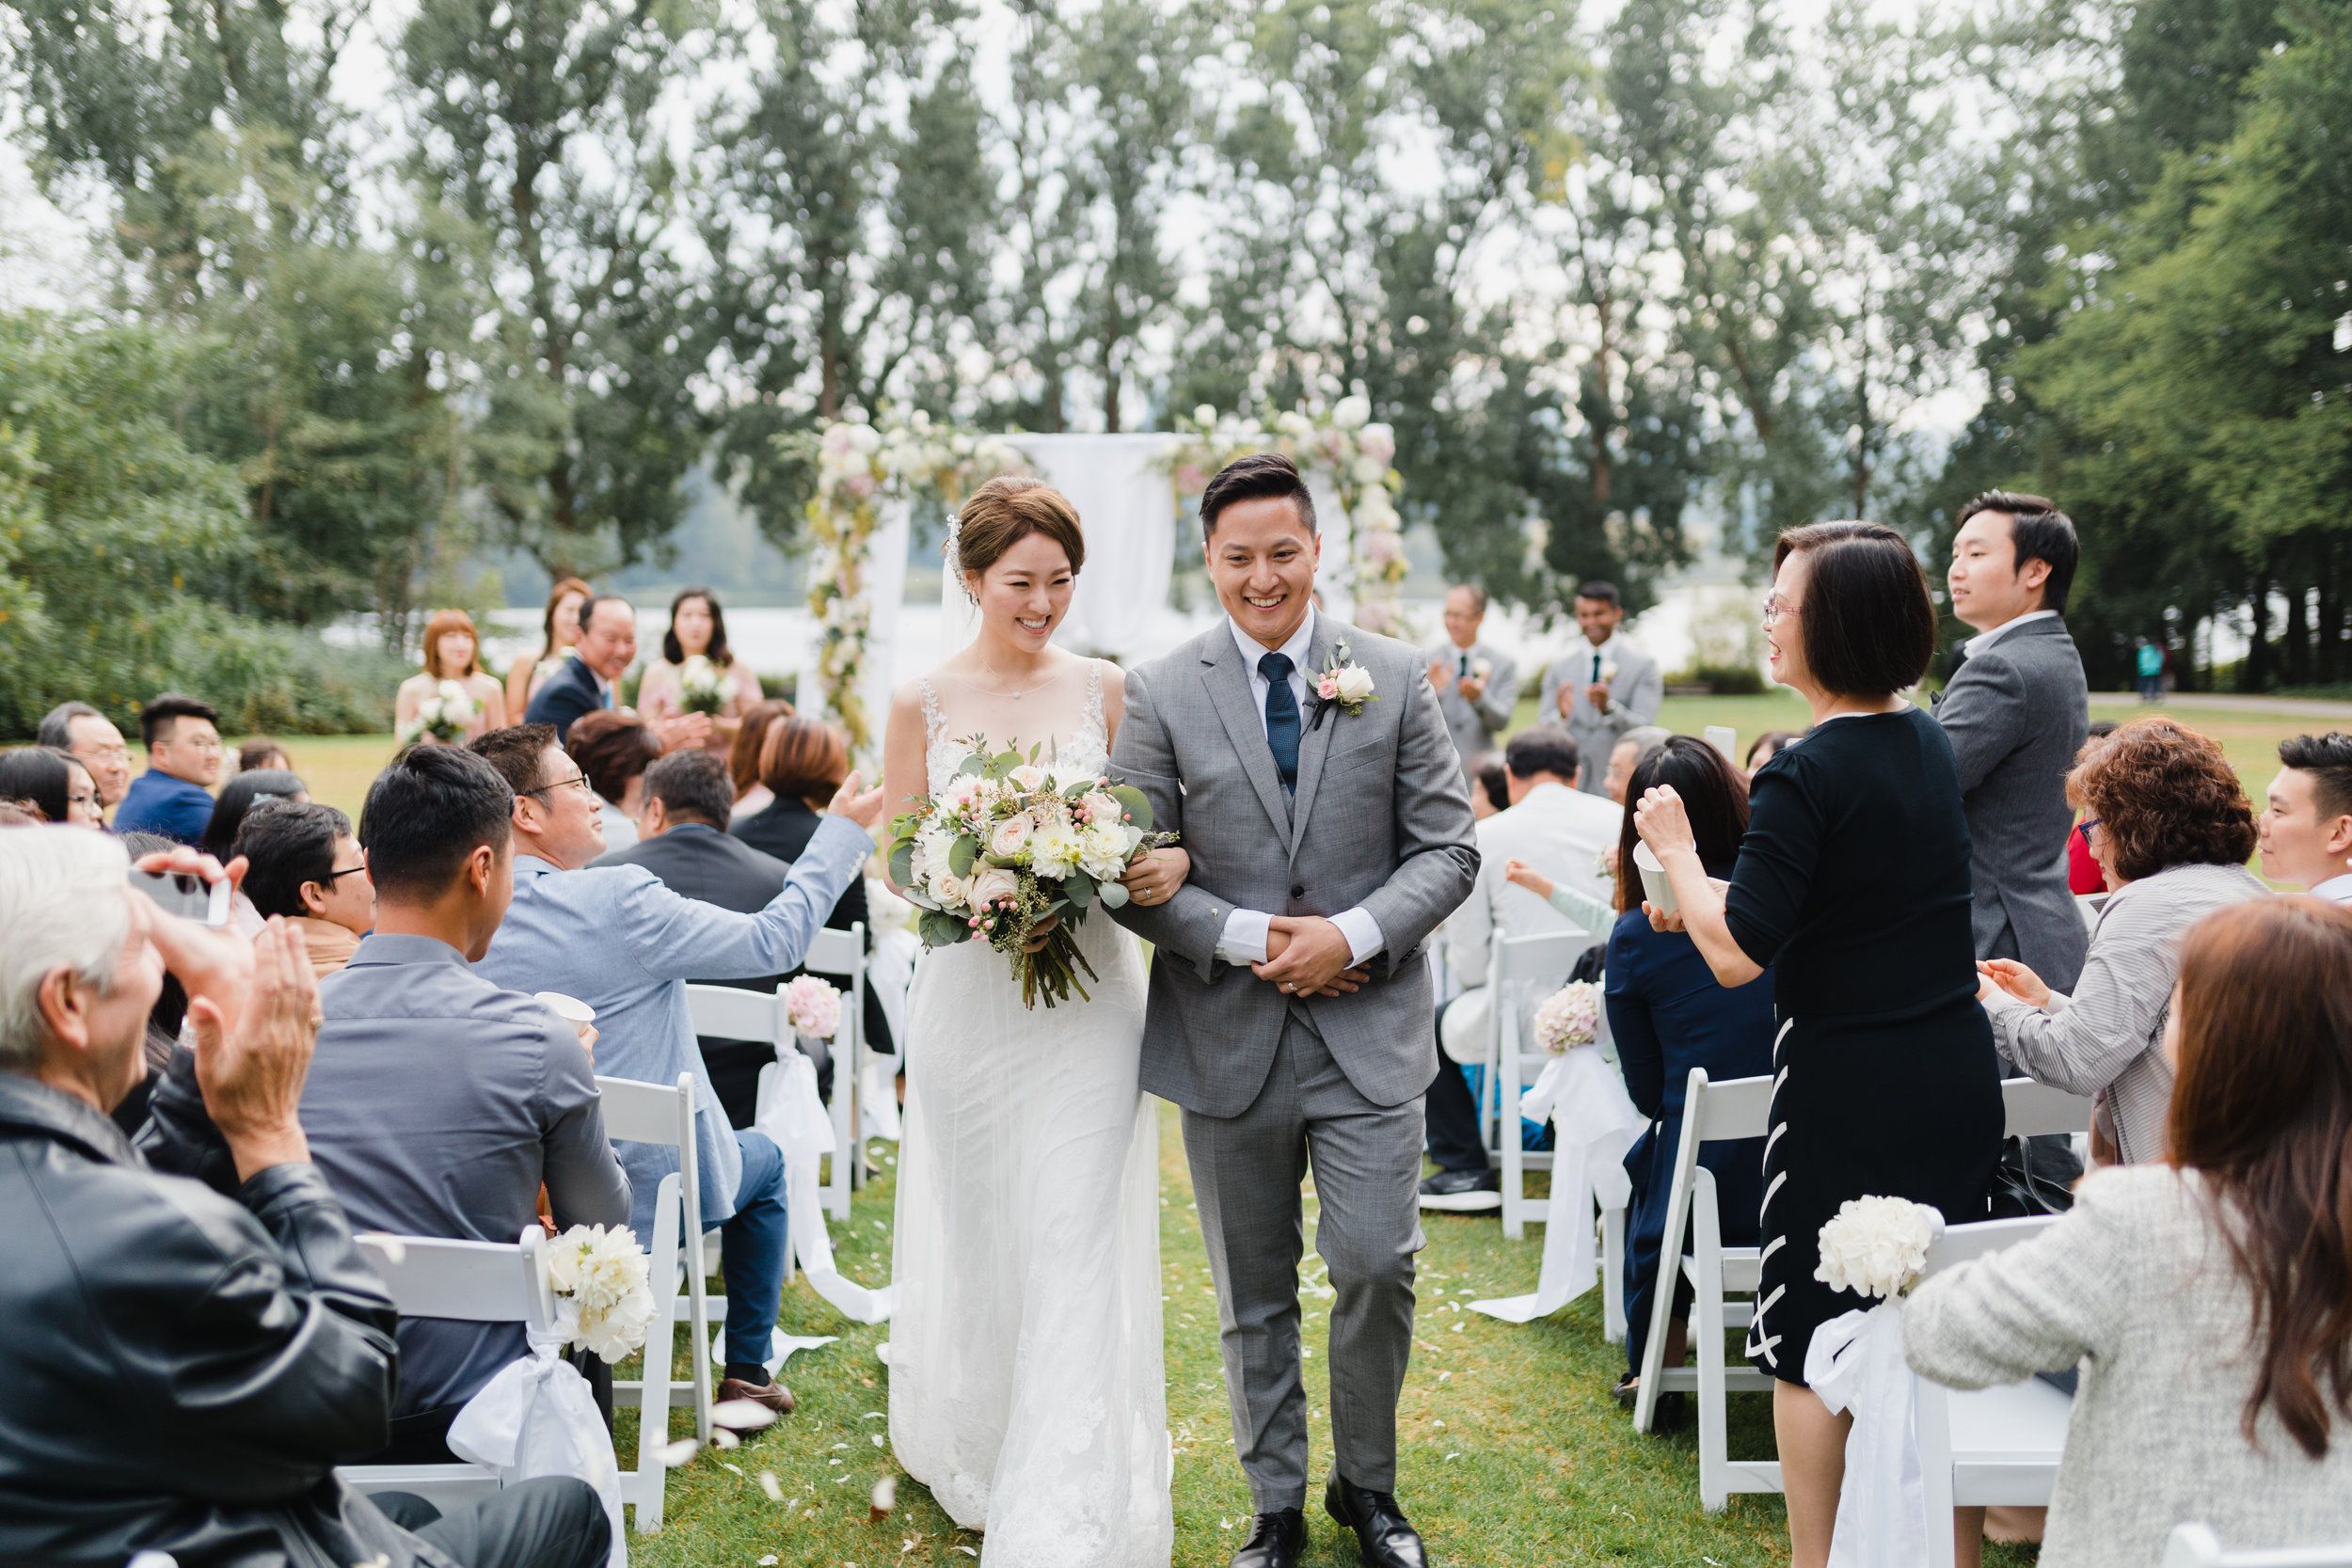 HeraStudios_CollectorsPackage_Full_DawonDavid_Wedding_0259.jpg